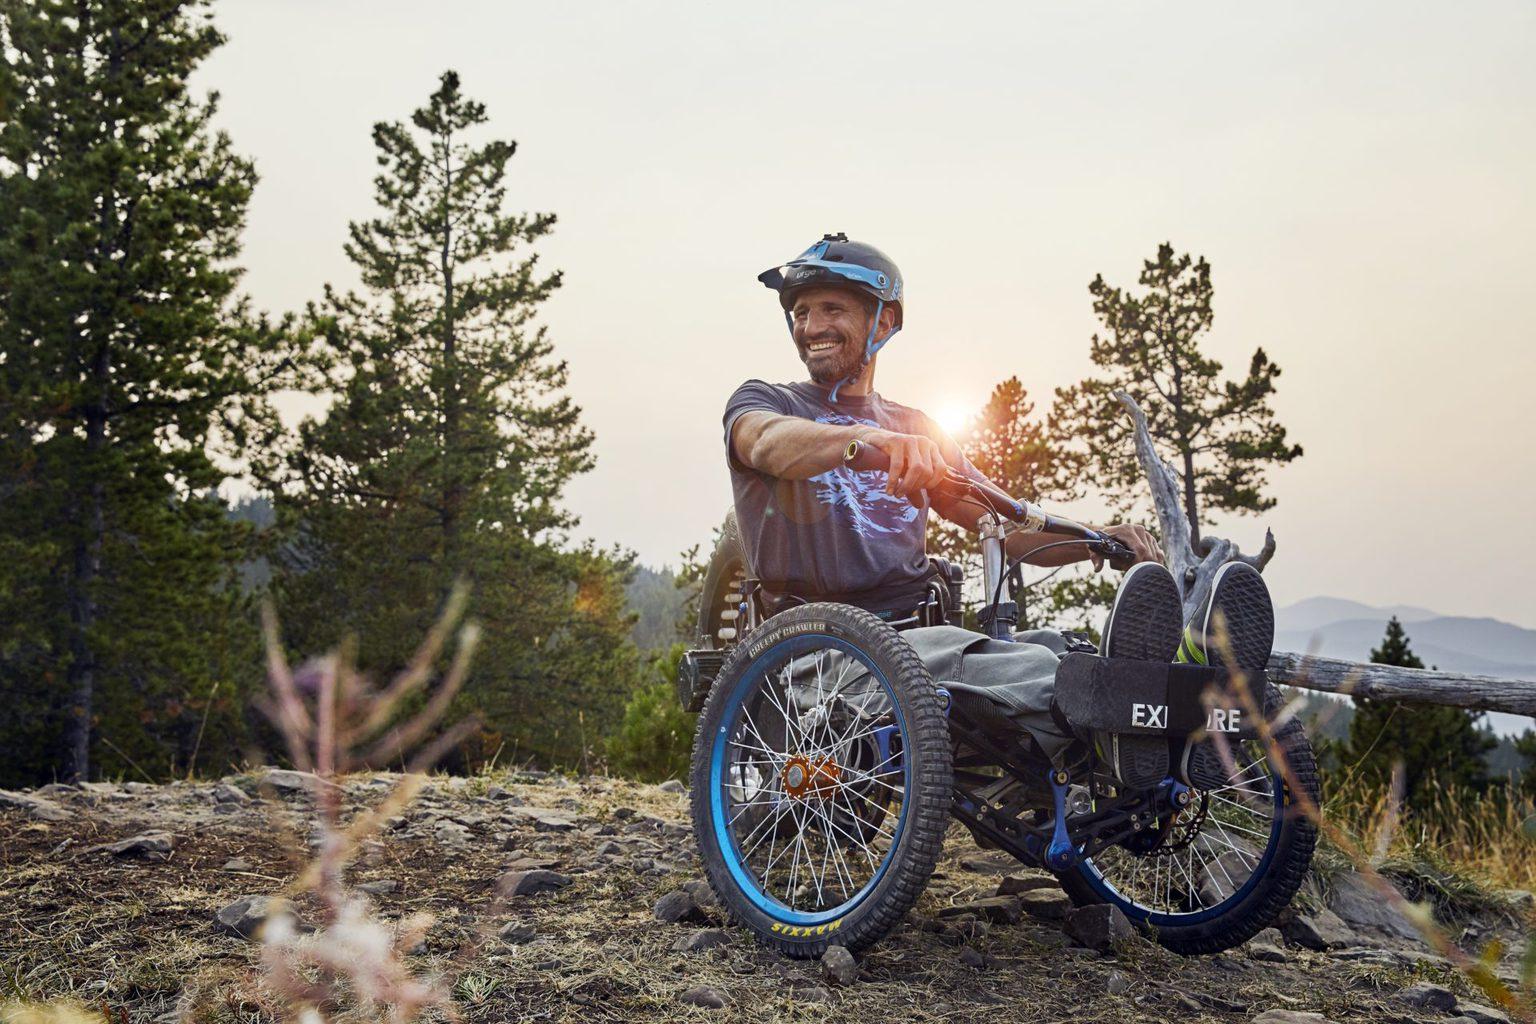 Christian Bagg: Engineering Trailblazer